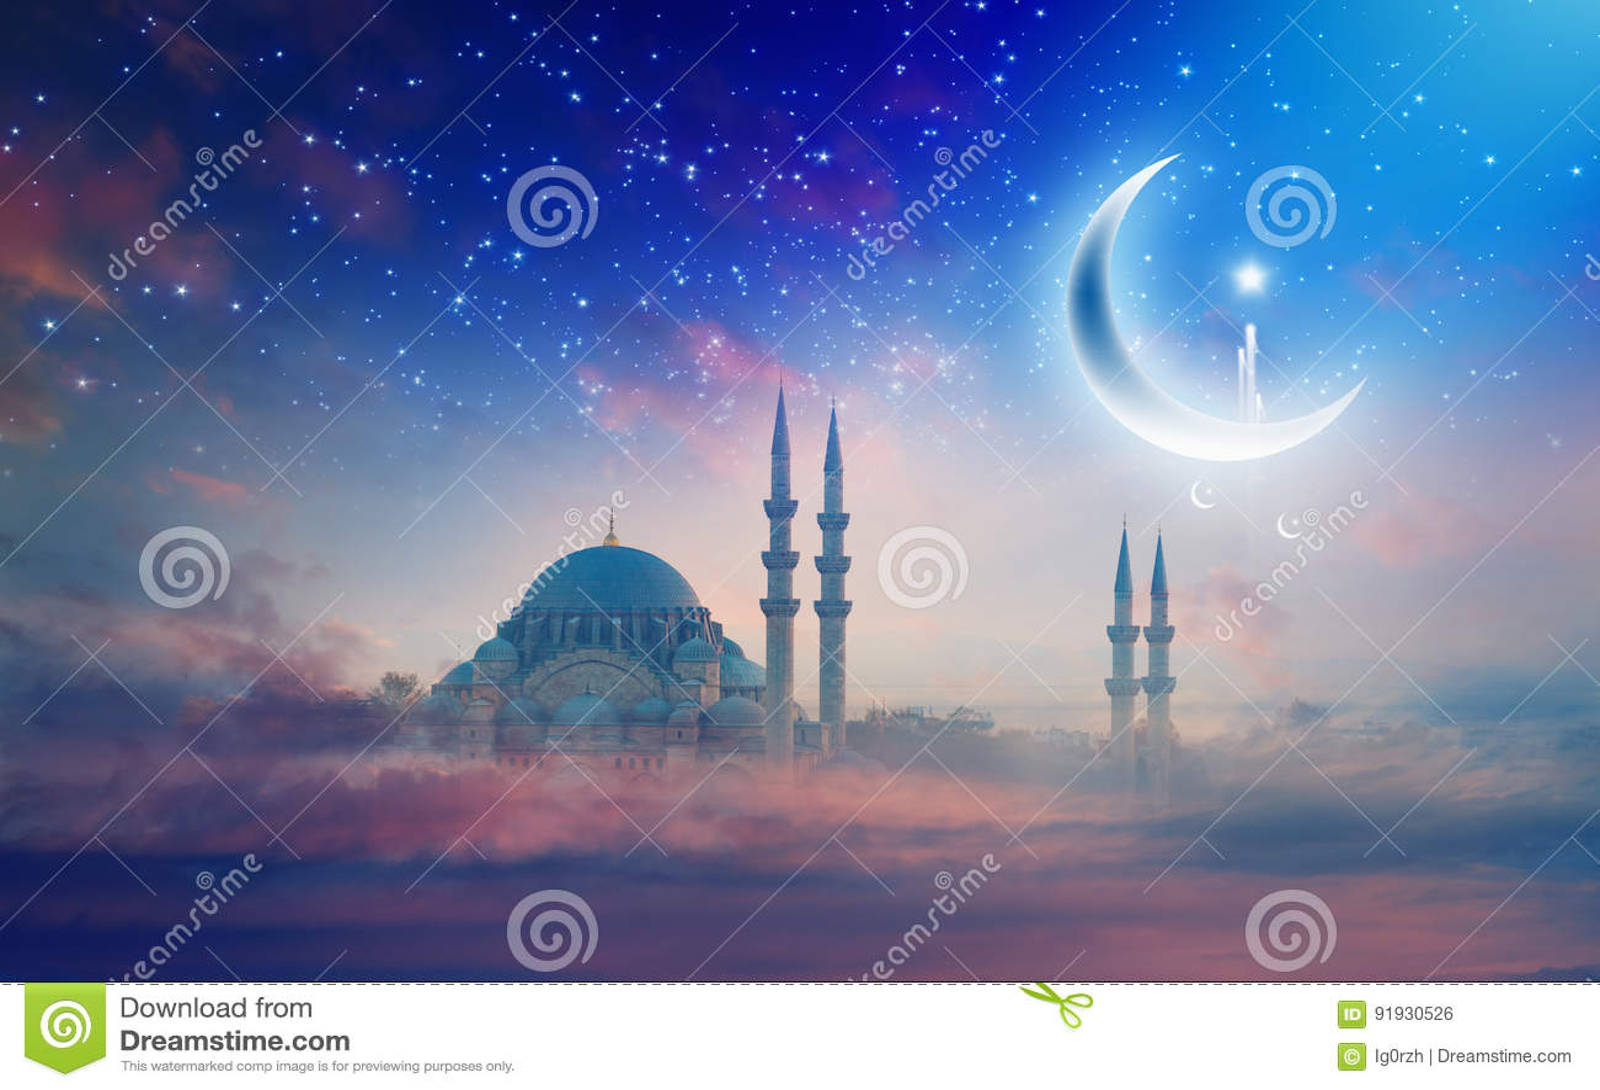 Ramadan Kareem background, Suleymaniye mosque in Istanbul